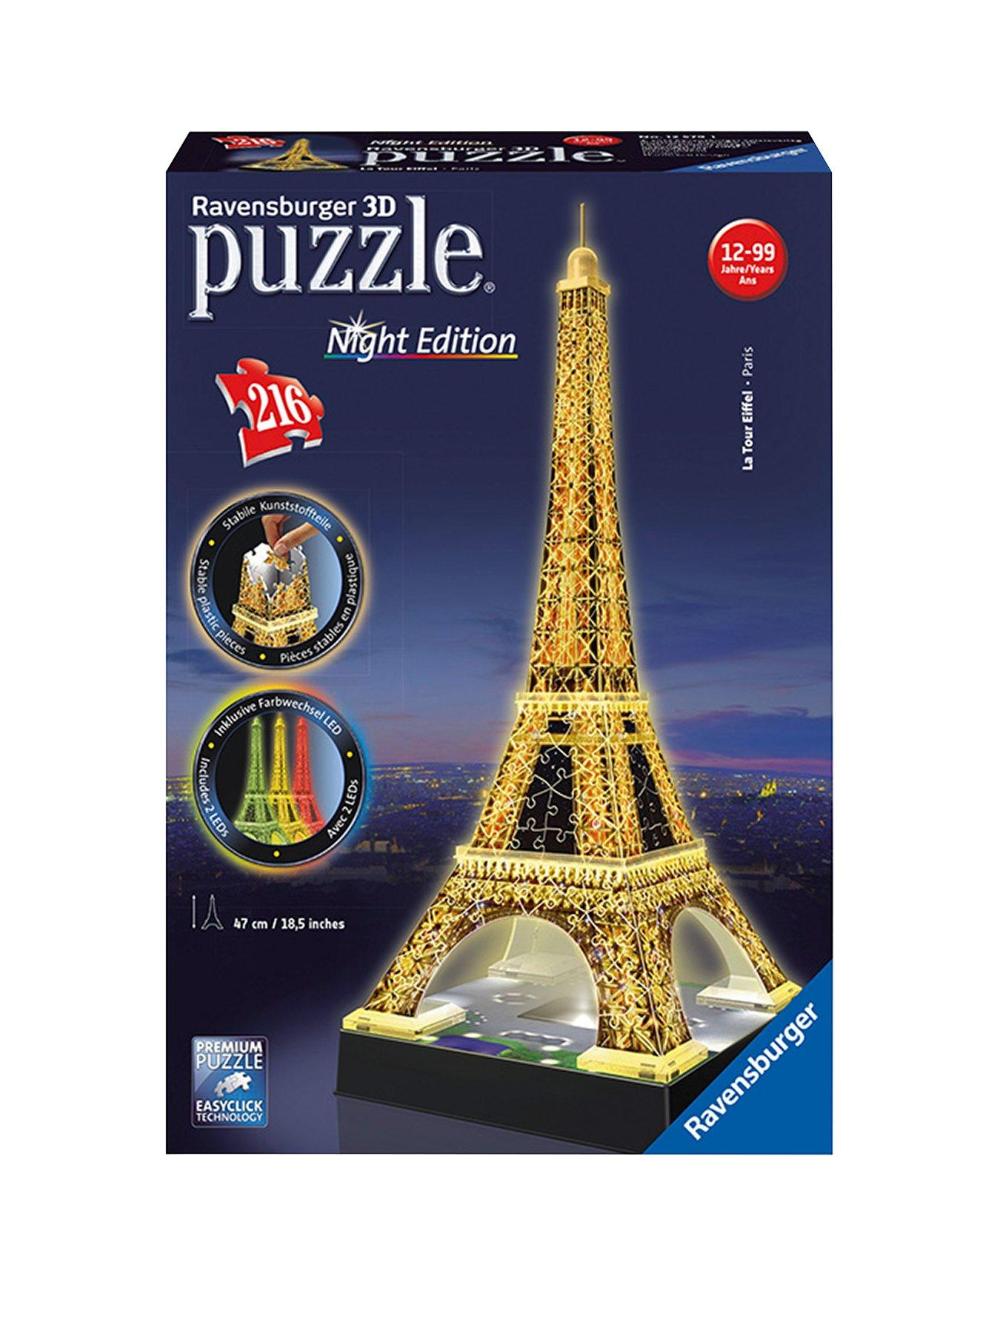 Ravensburger Eiffel Tower Night Edition 3d Puzzle In 2020 Eiffel Tower 3d Puzzle Eiffel Tower Puzzle Eiffel Tower